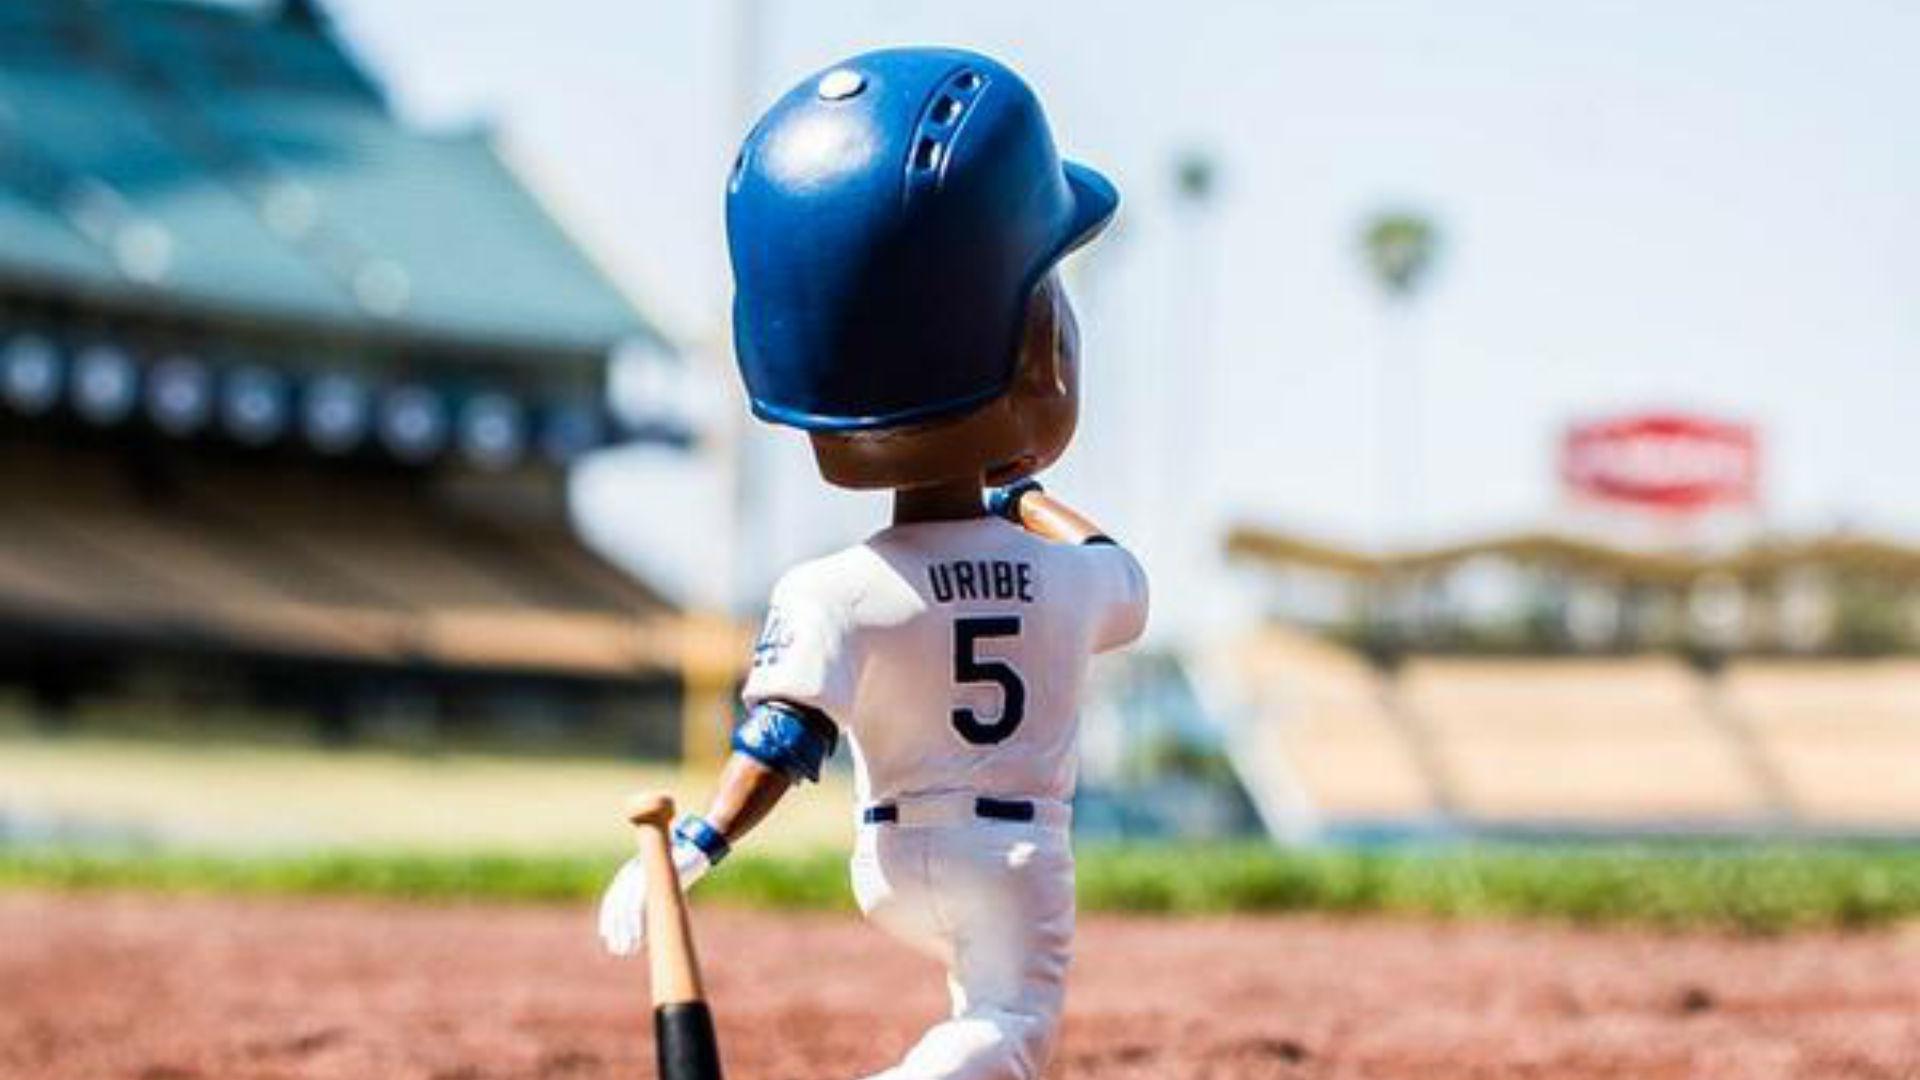 Dodgers still holding bobblehead night for Juan Uribe after trade